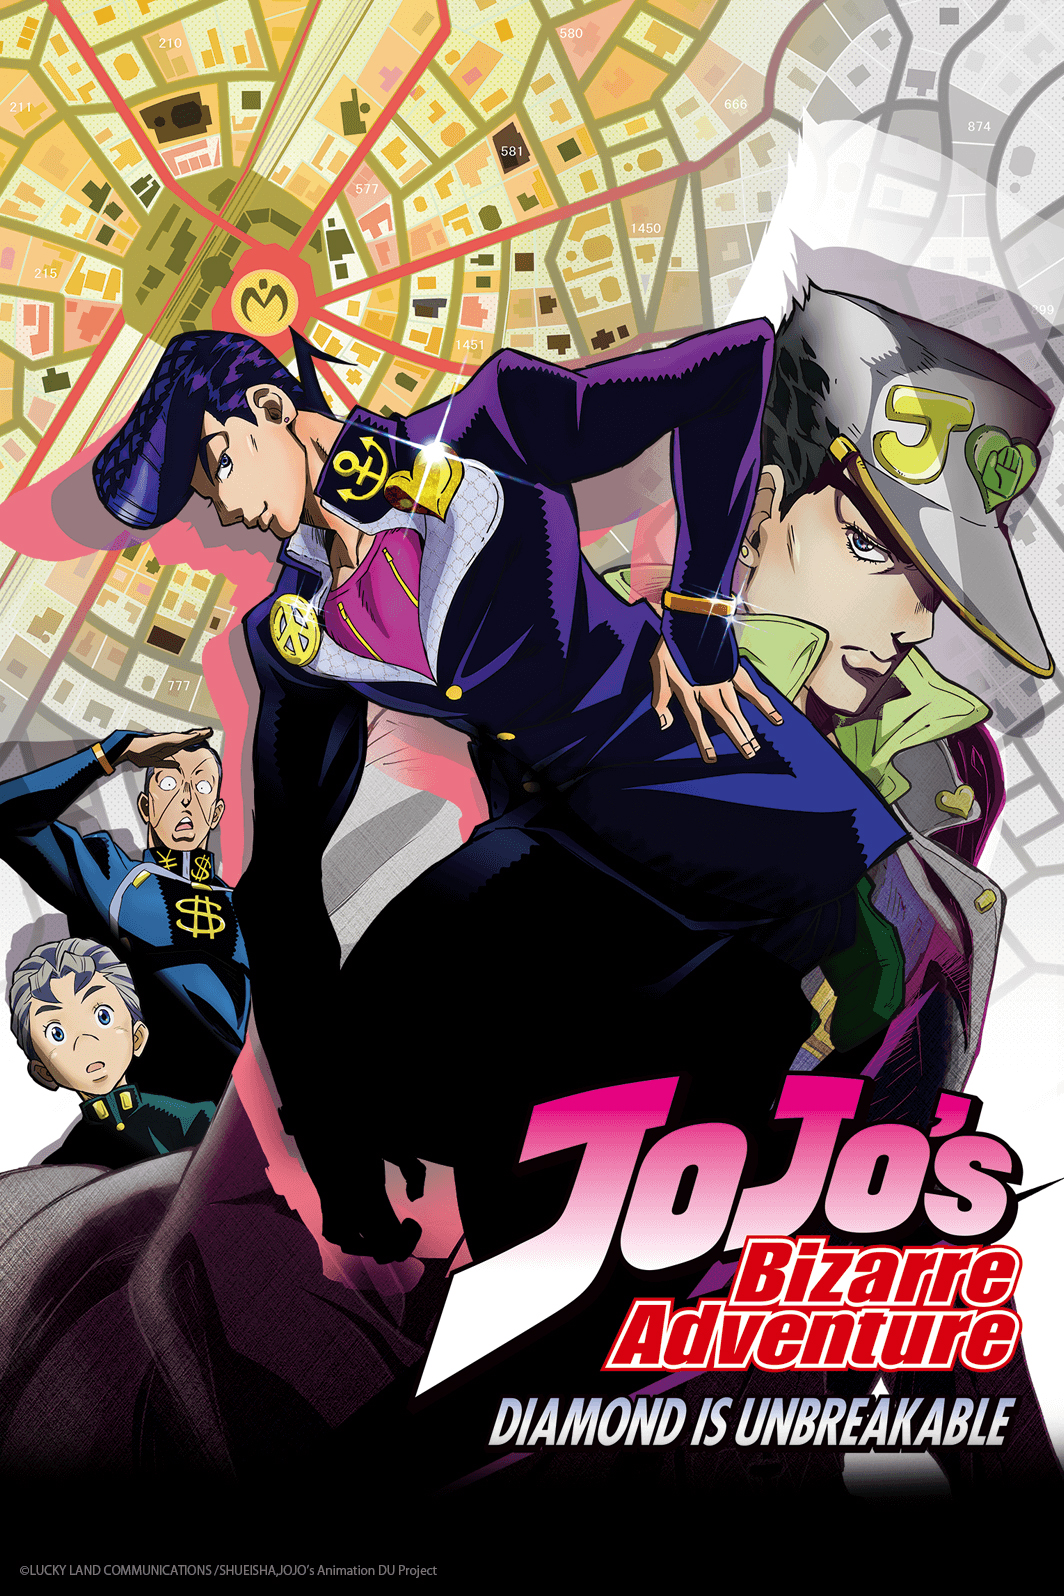 Jojo's Bizarre Adventure - Diamond is unbreakable